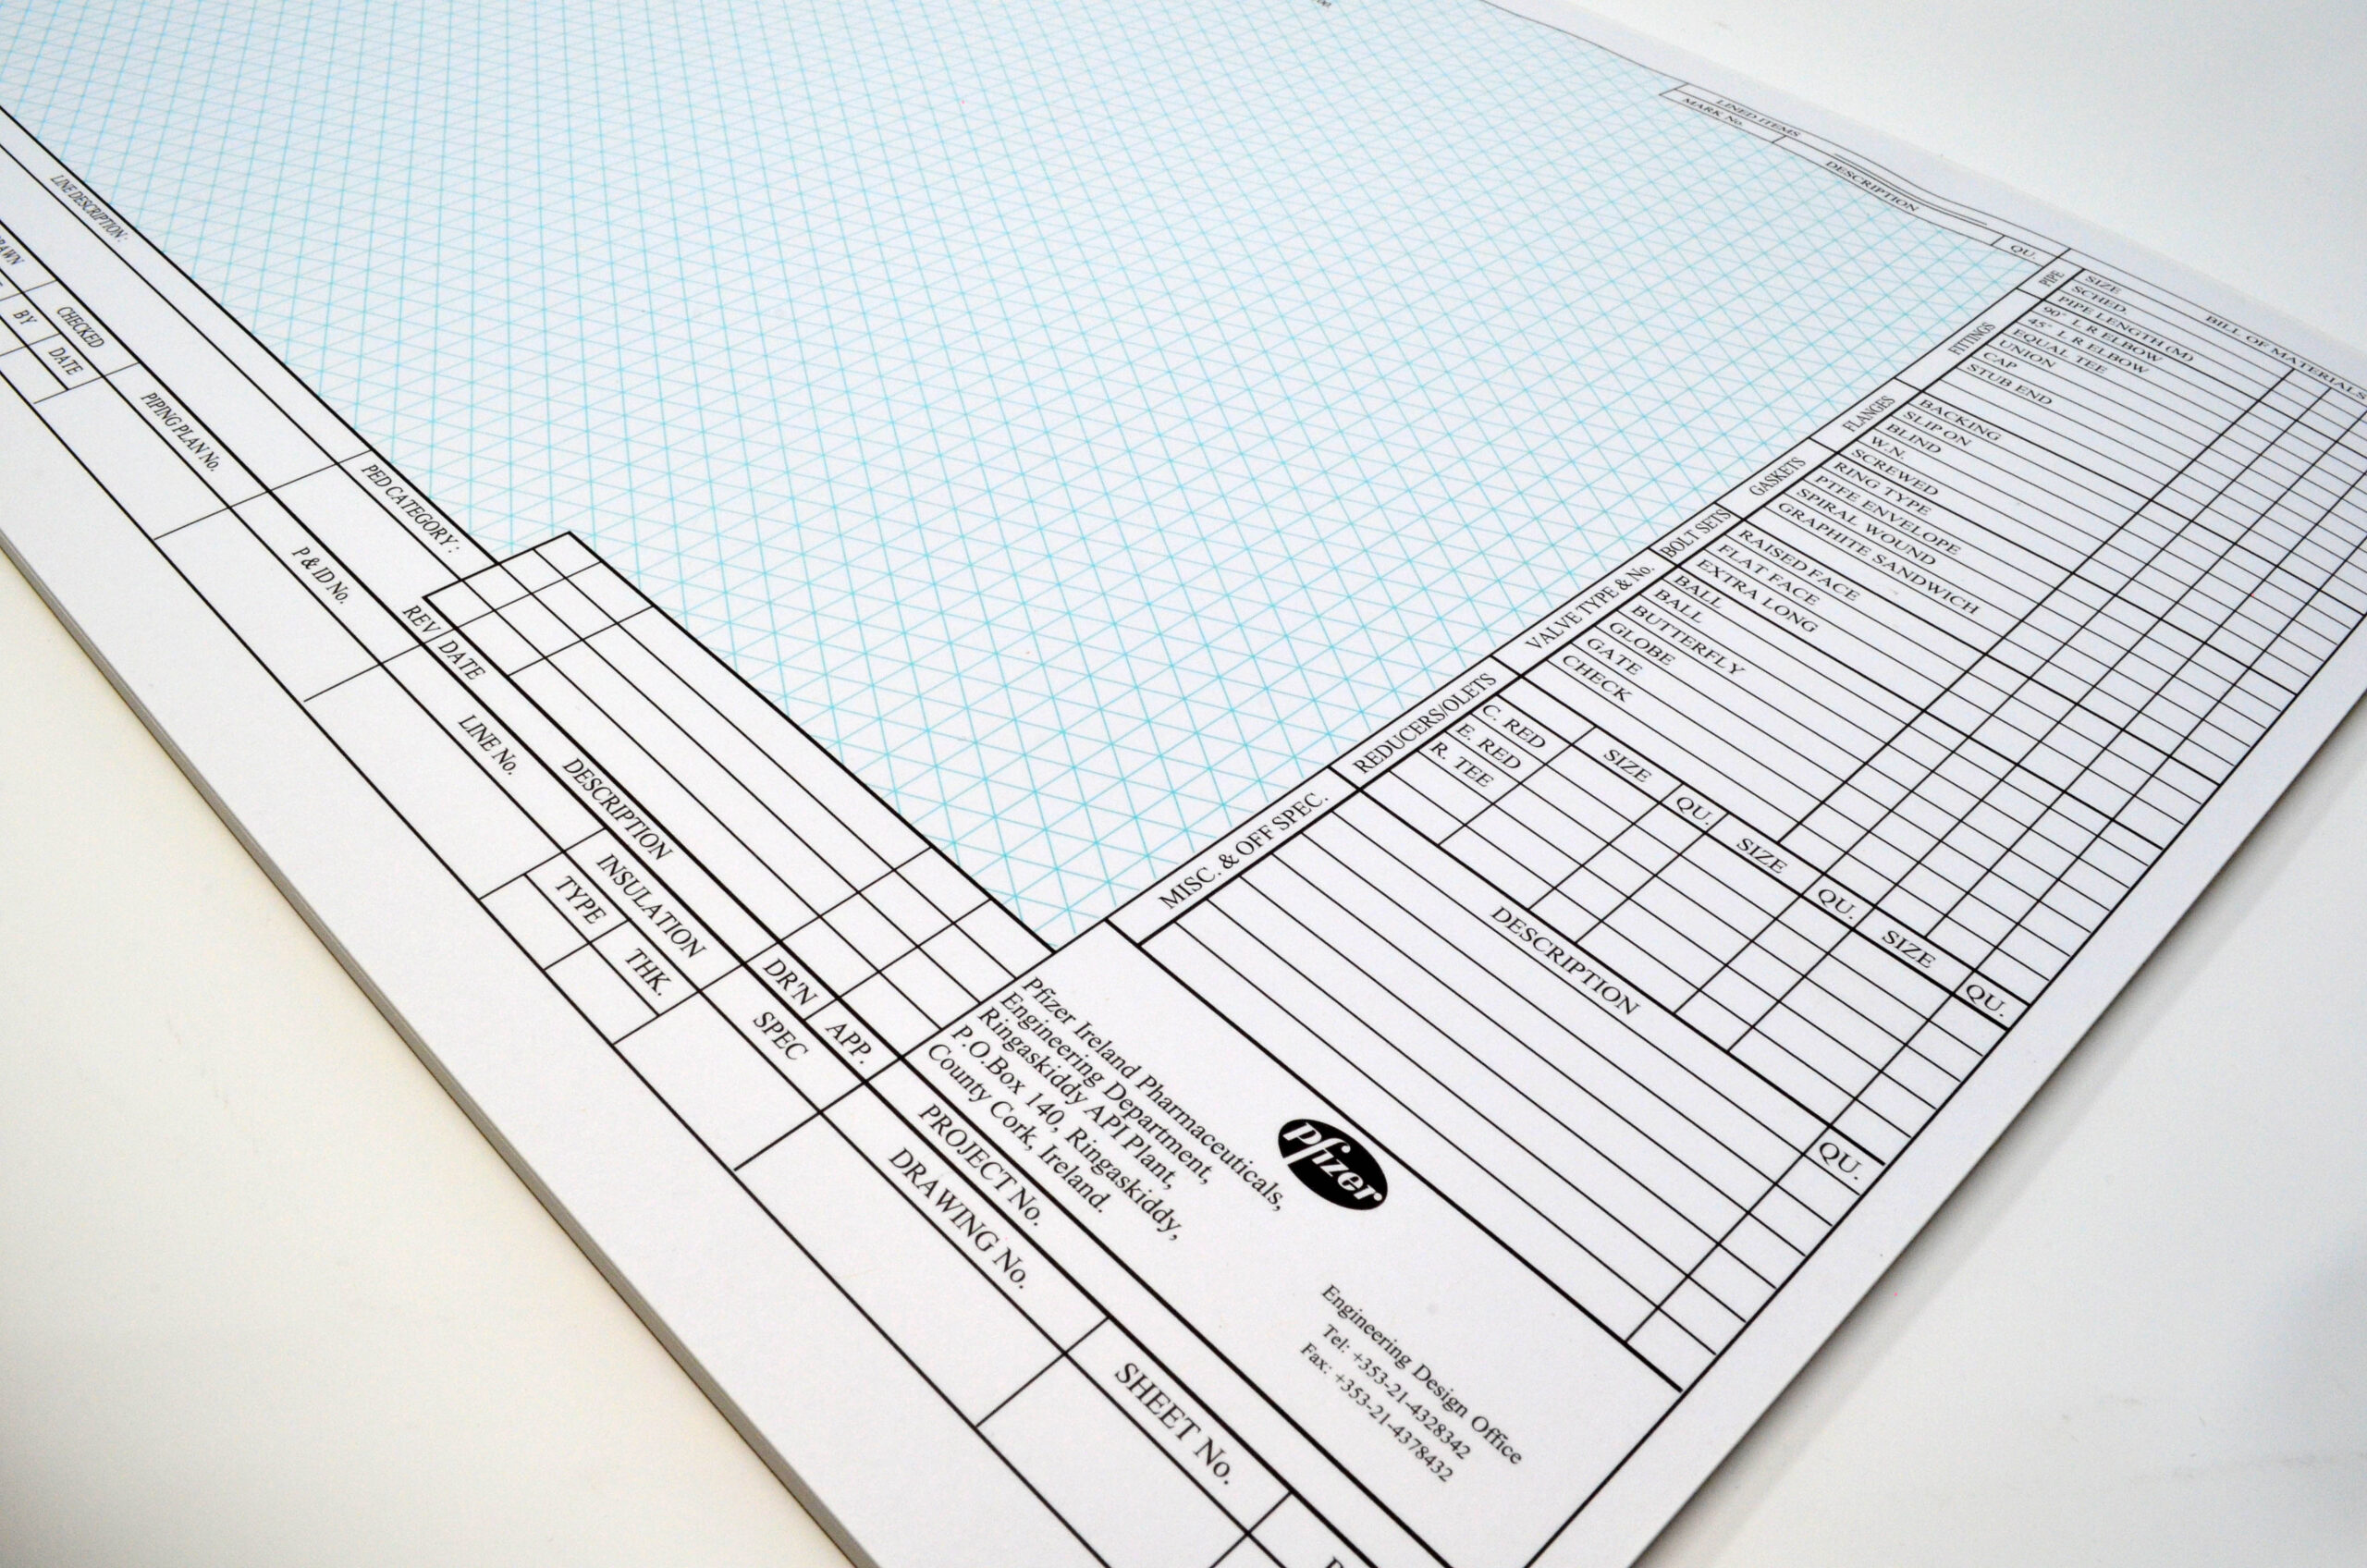 Pfizer Sketch Pad